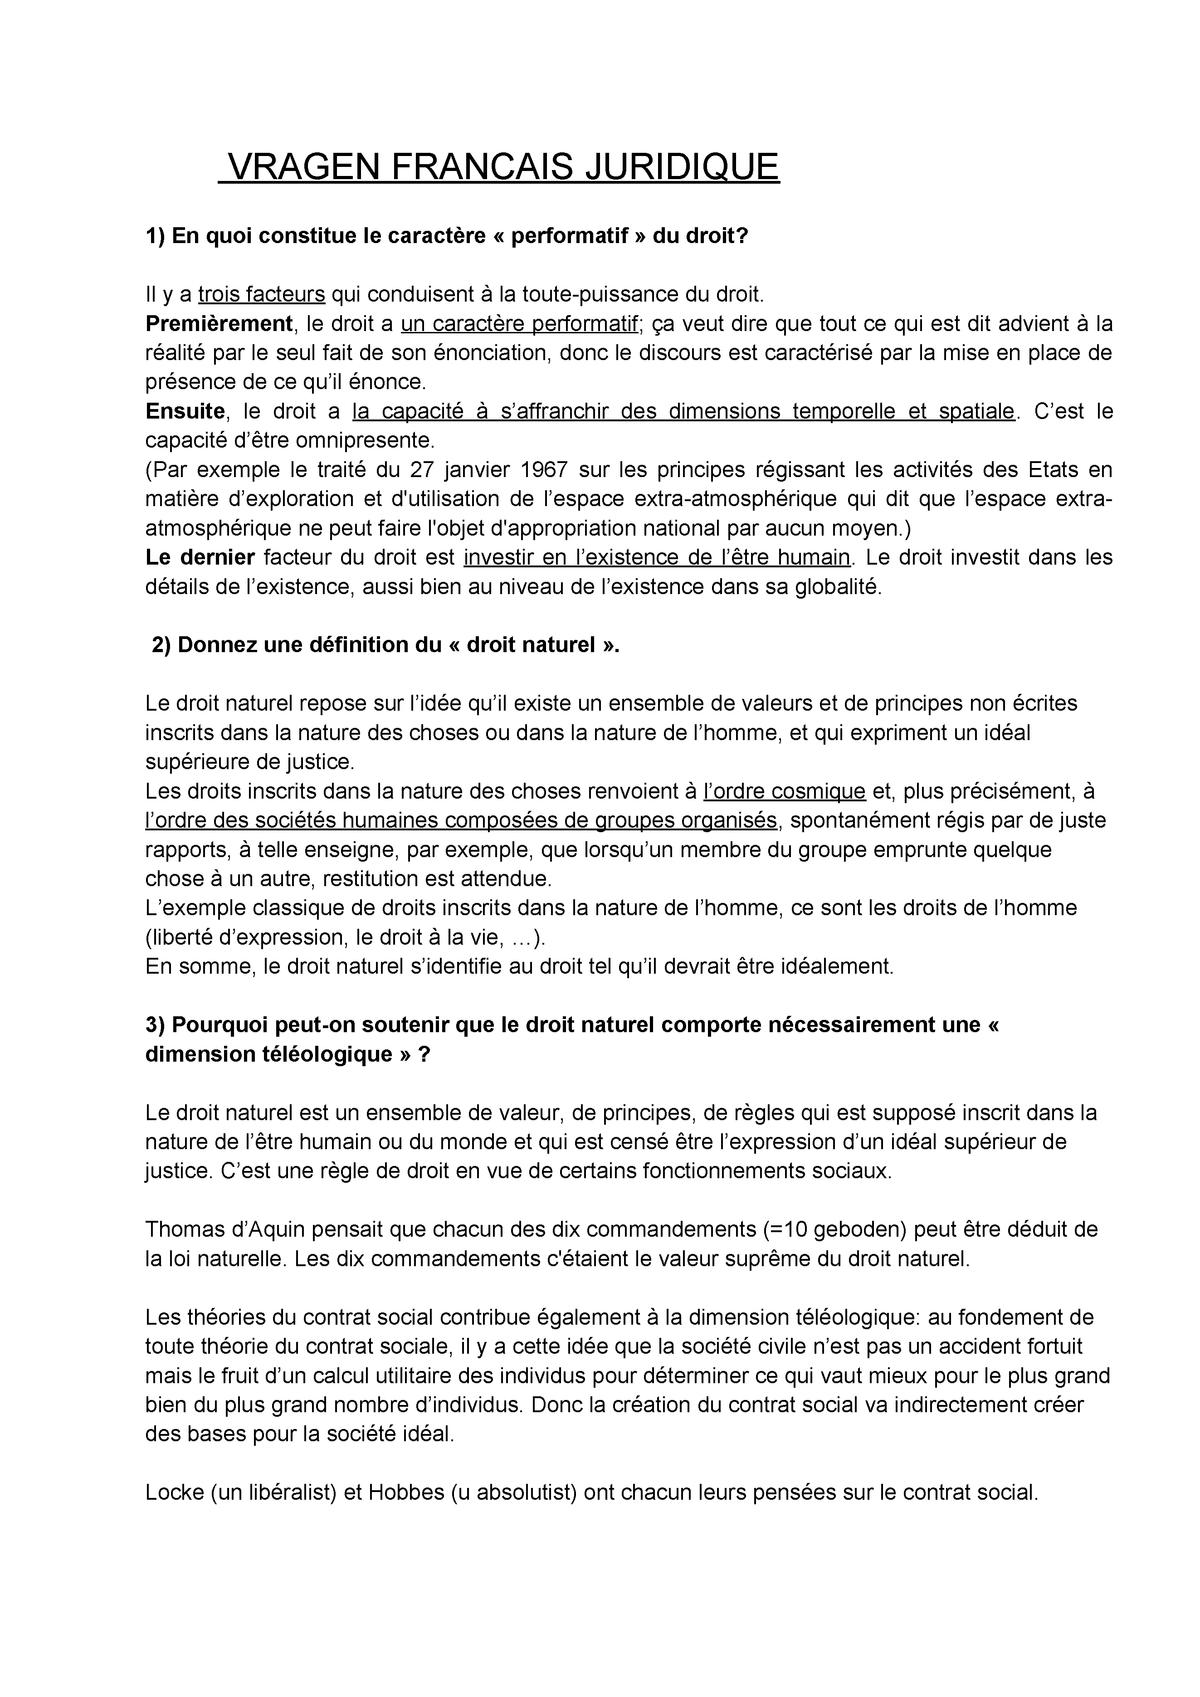 Bonus Porte Interne 2018 vragen- frans - samengevat - law 200 legal studies - studocu